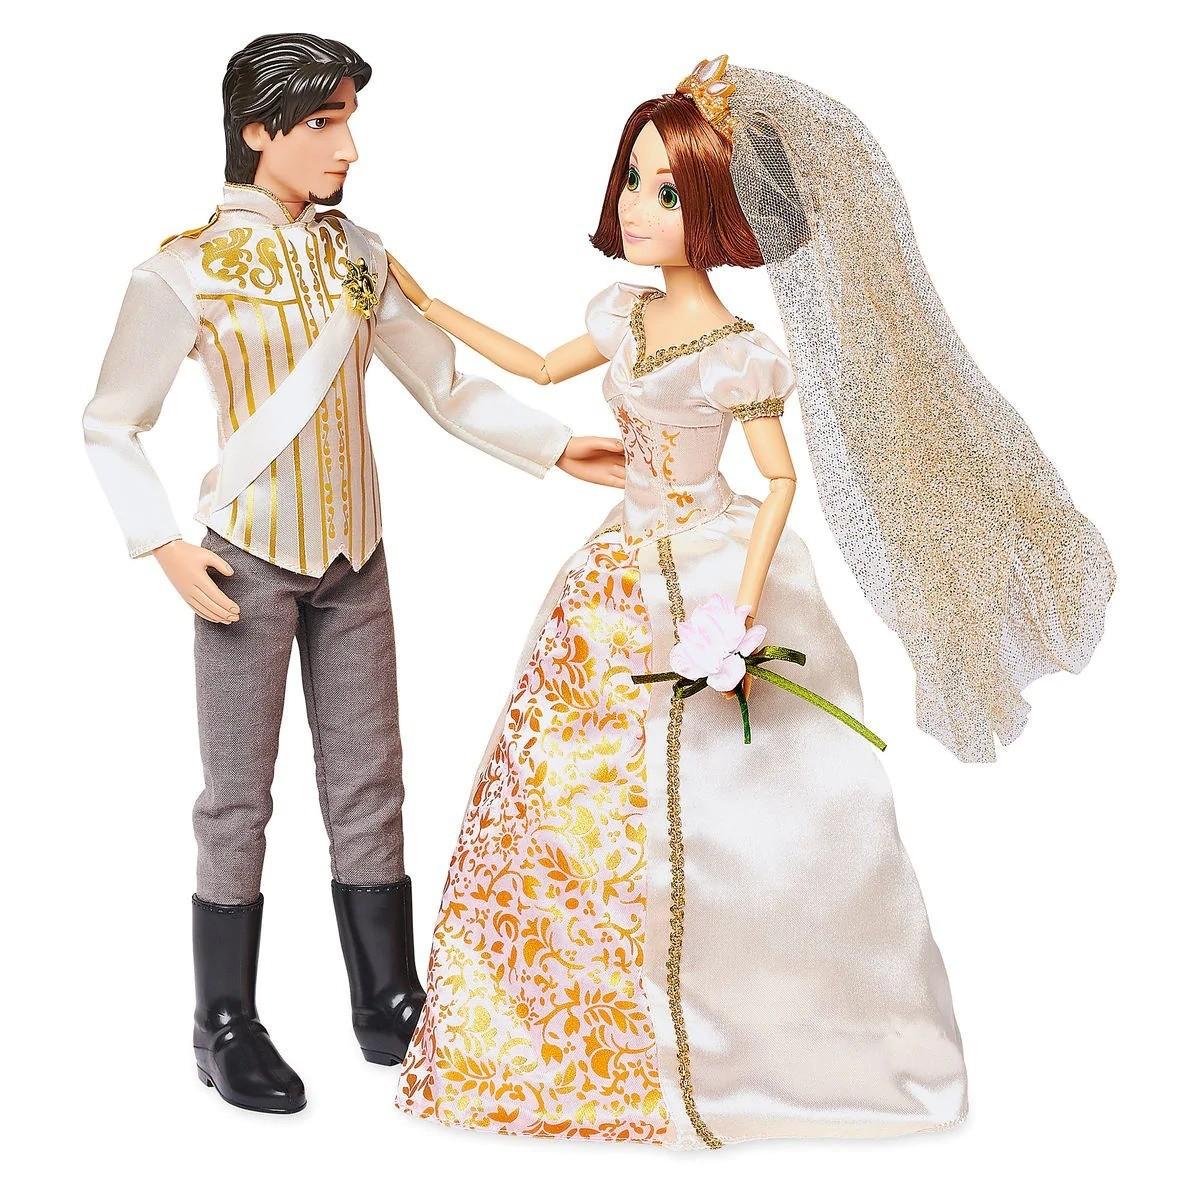 Muñeca Boda Rapunzel y Principe